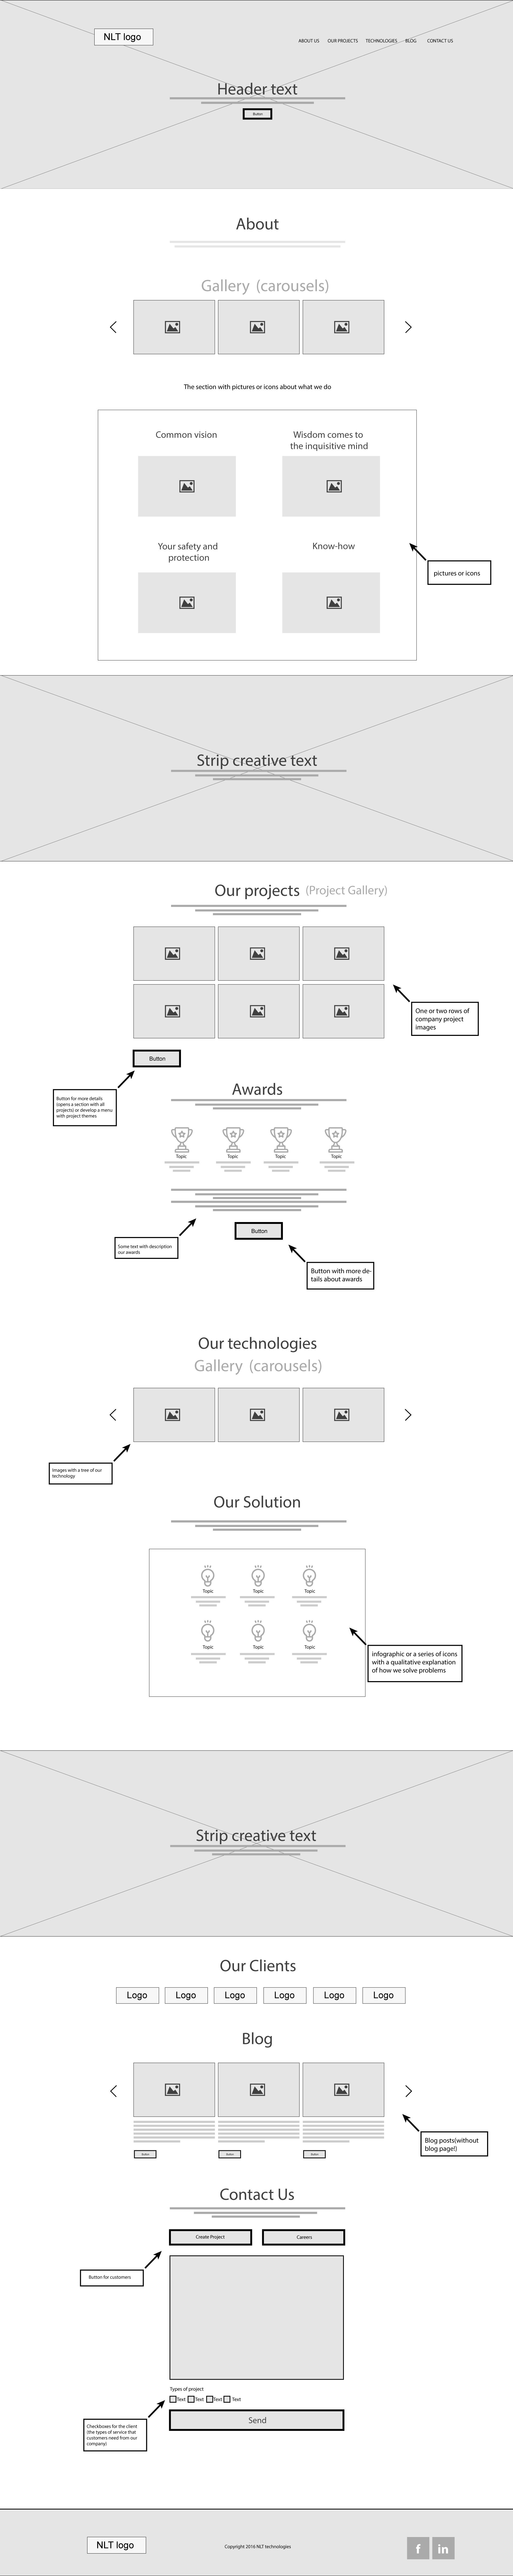 wireframe_FINAL_website